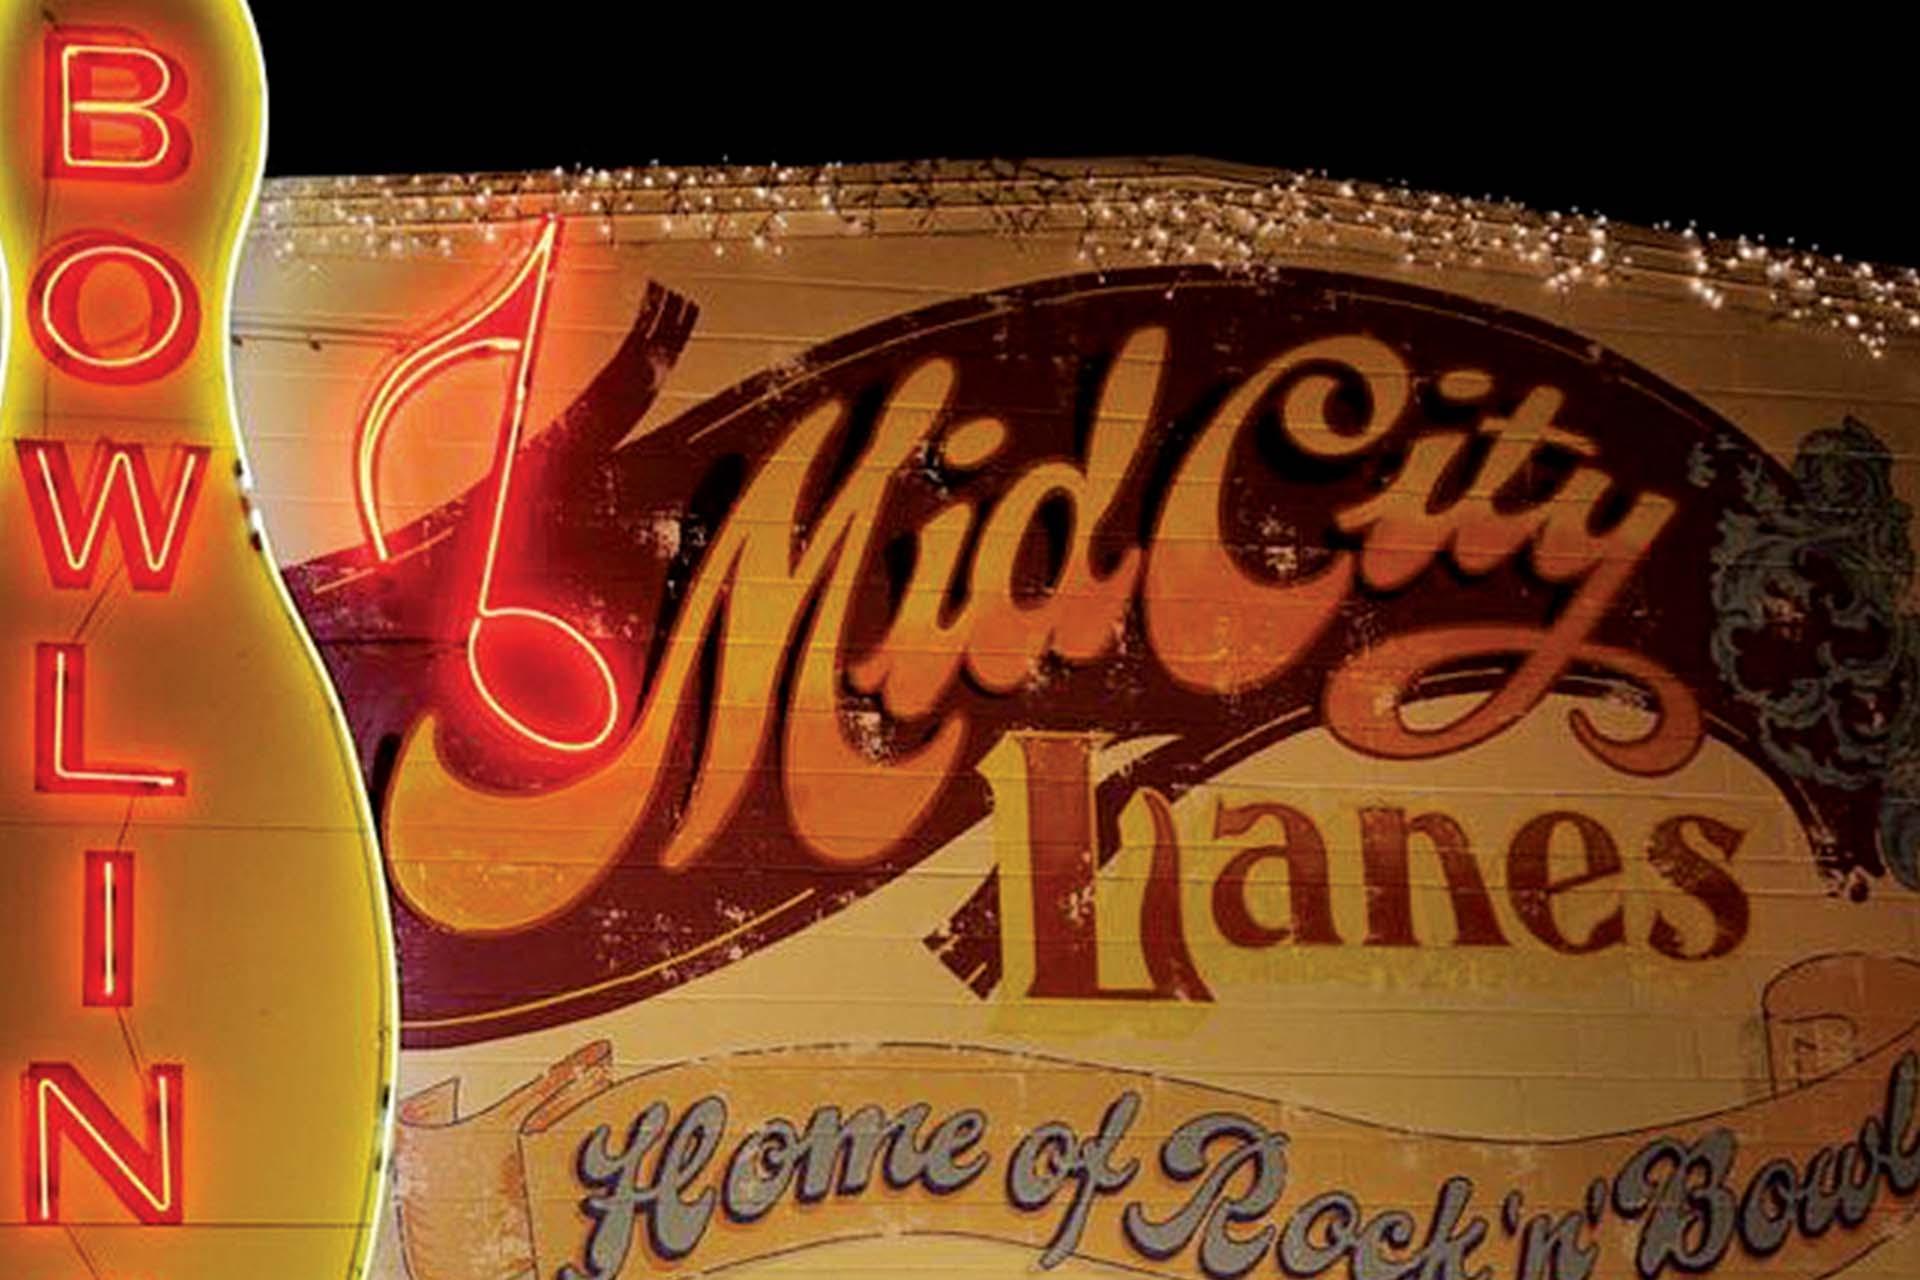 Mid City Lanes Rock 'n' Bowl